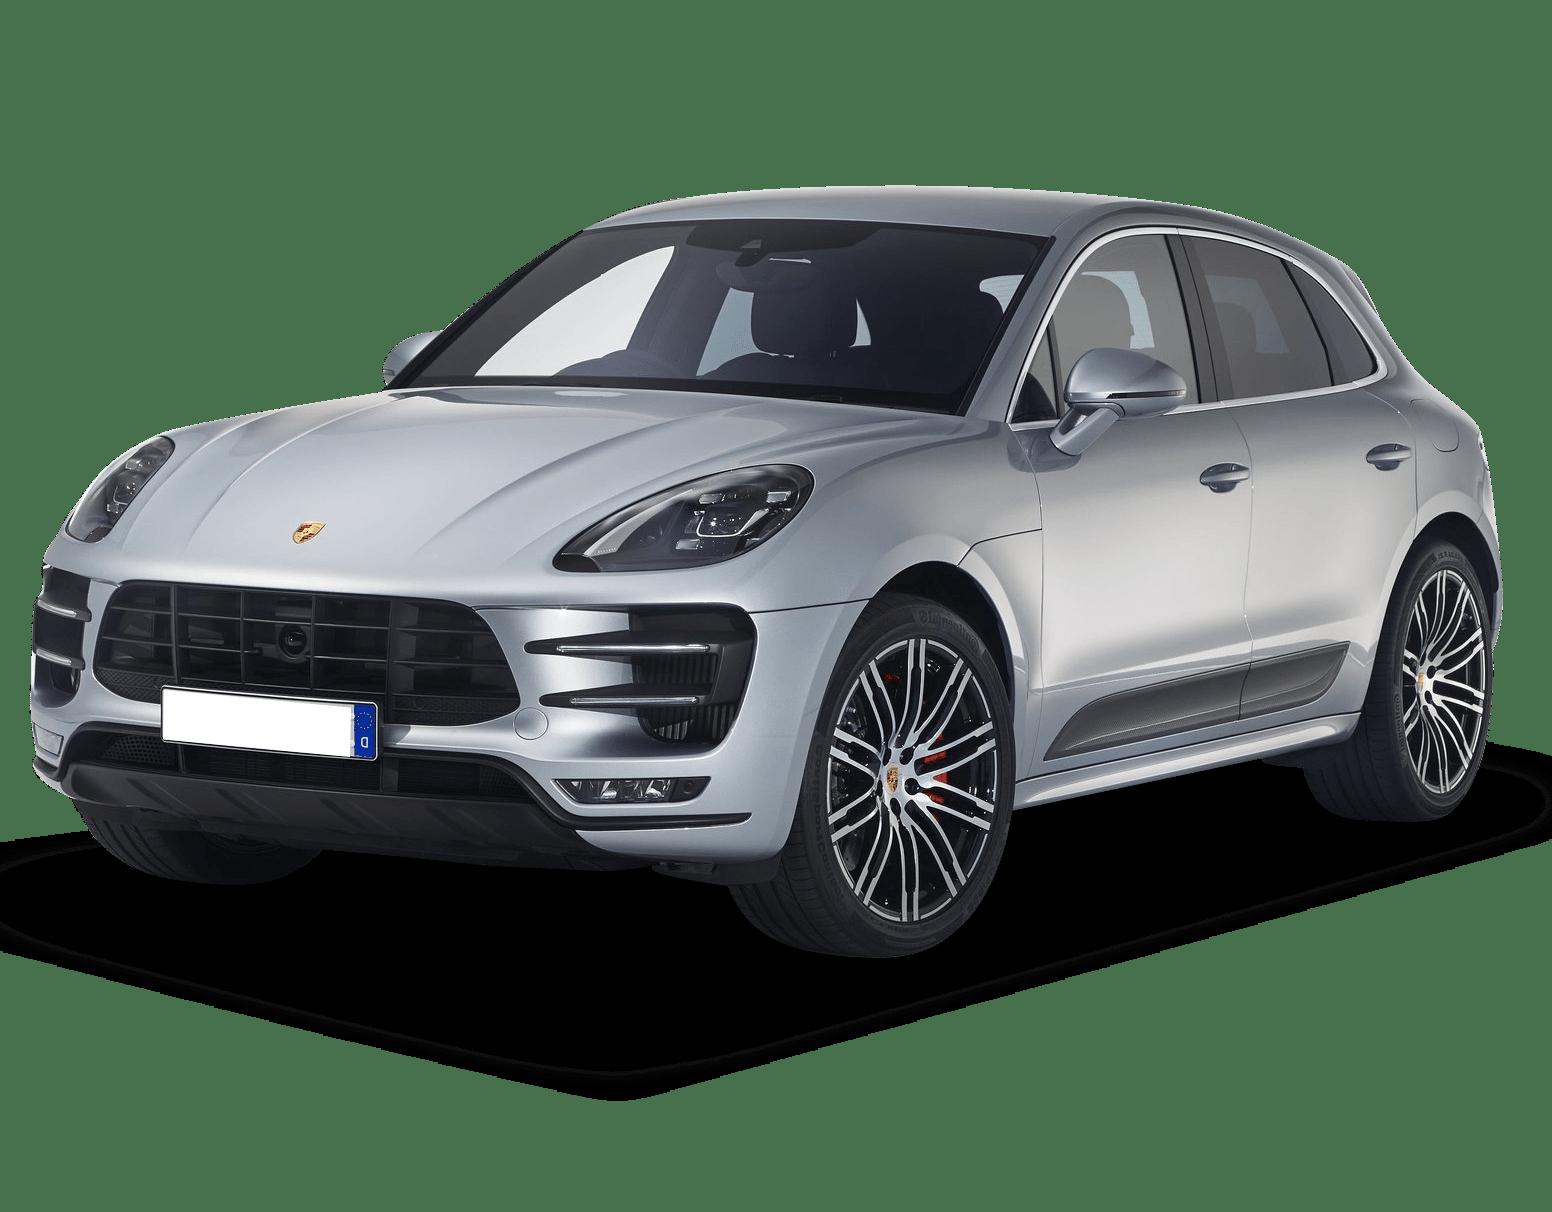 Porsche Macan Review Price For Sale Colours Interior In Australia Carsguide